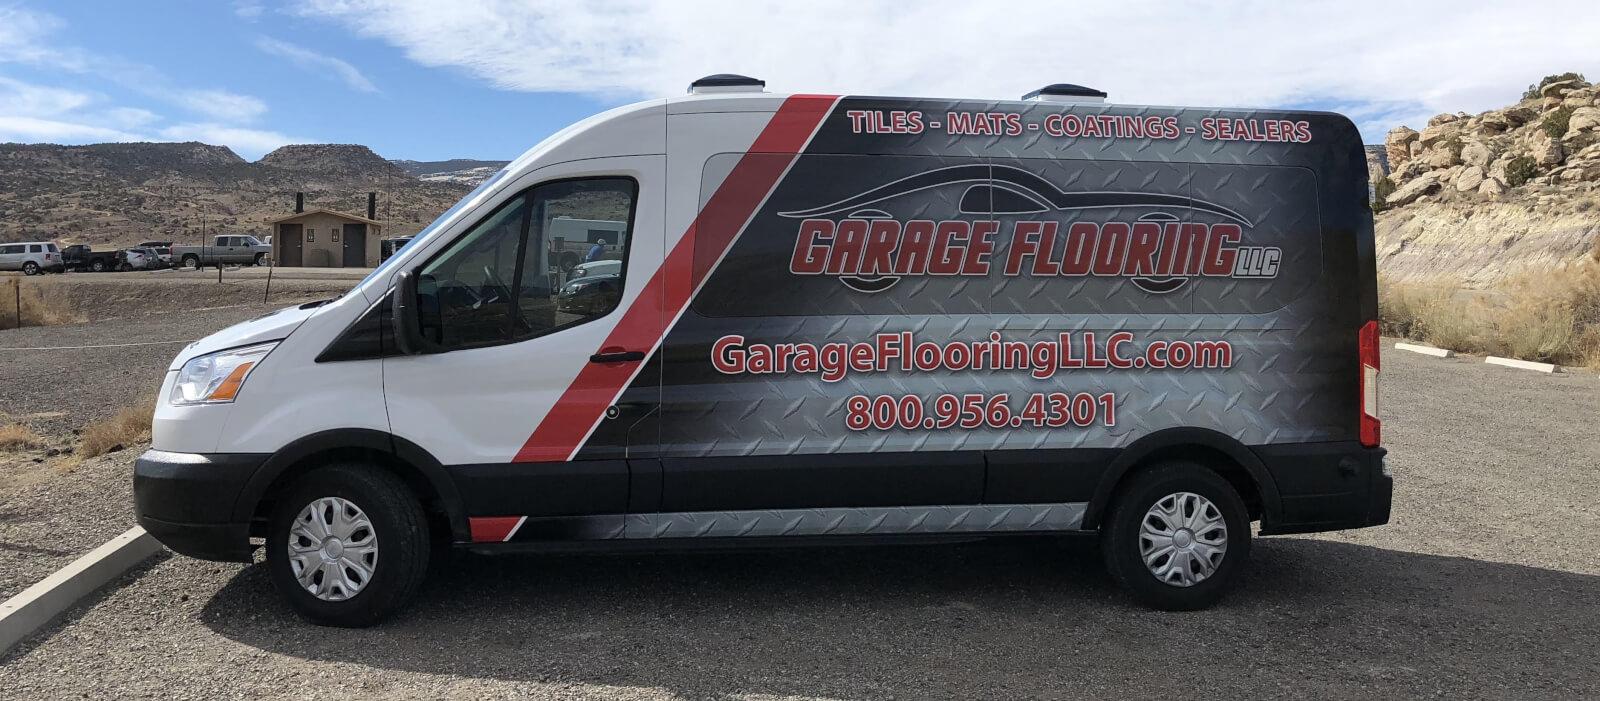 Garage Flooring -- Local Deals